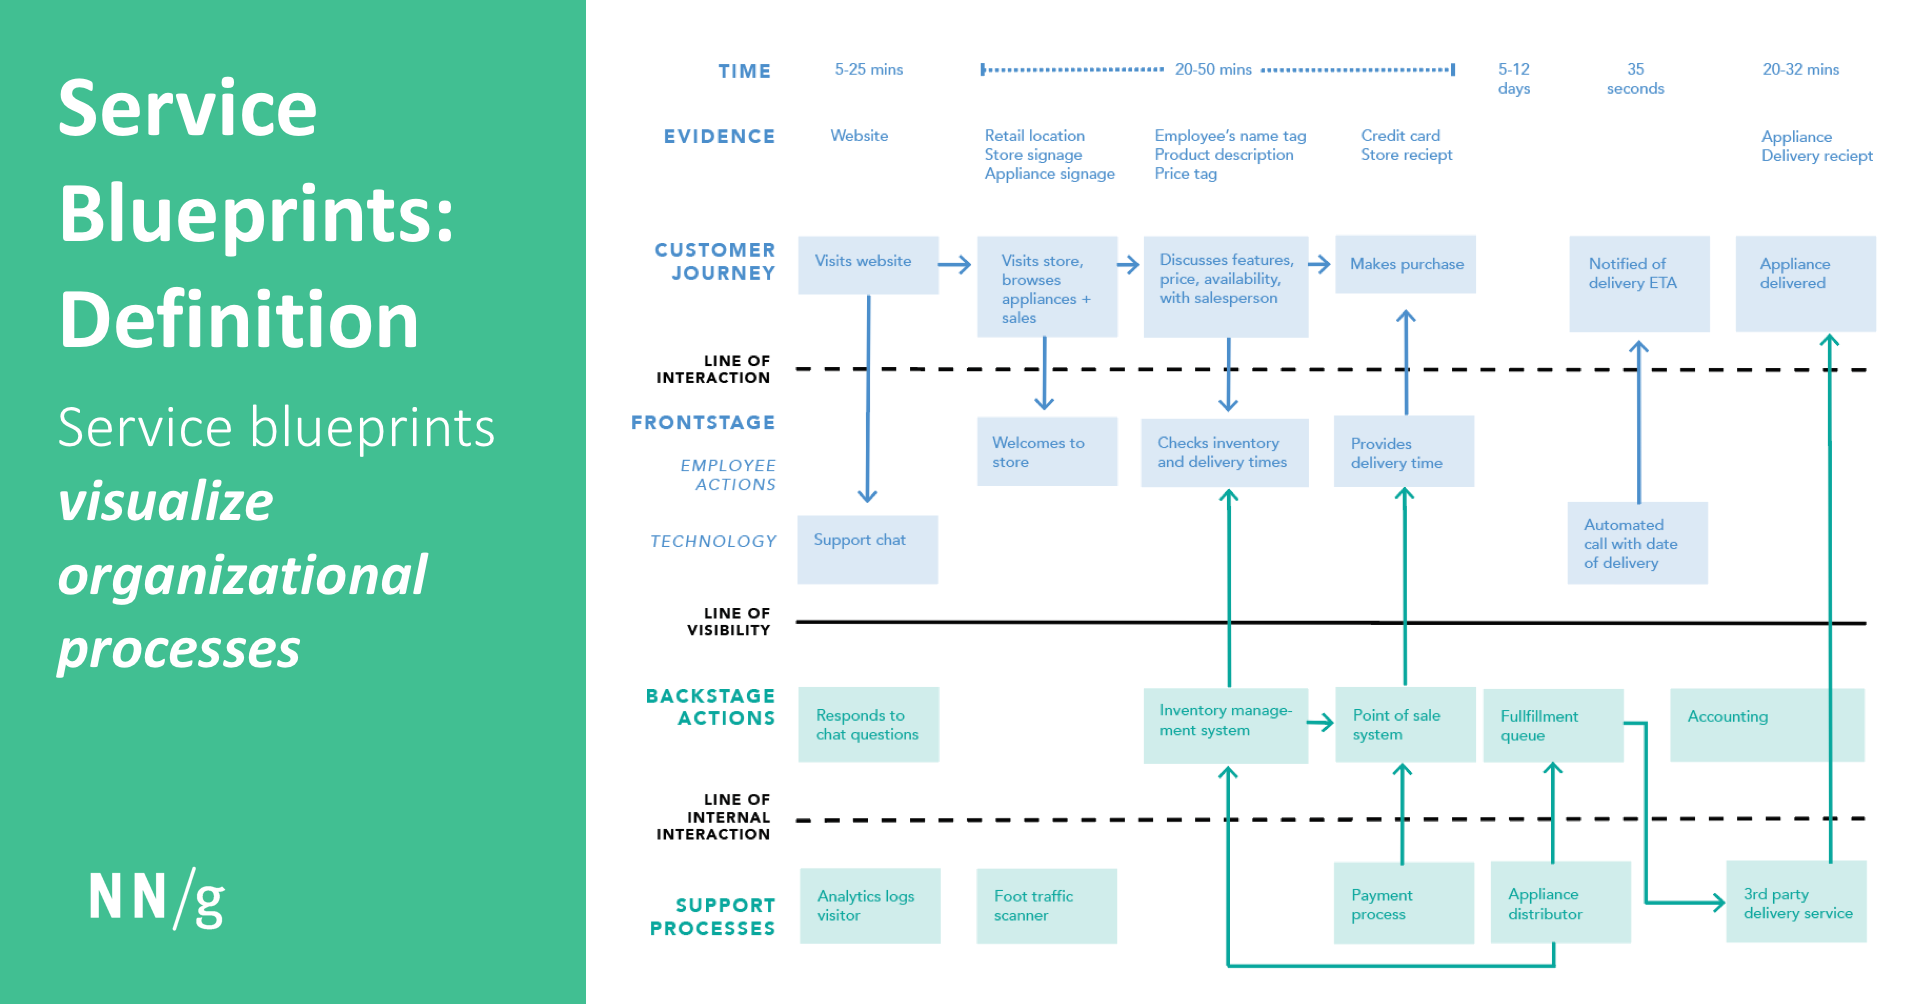 Service blueprints visualize organizational processes in